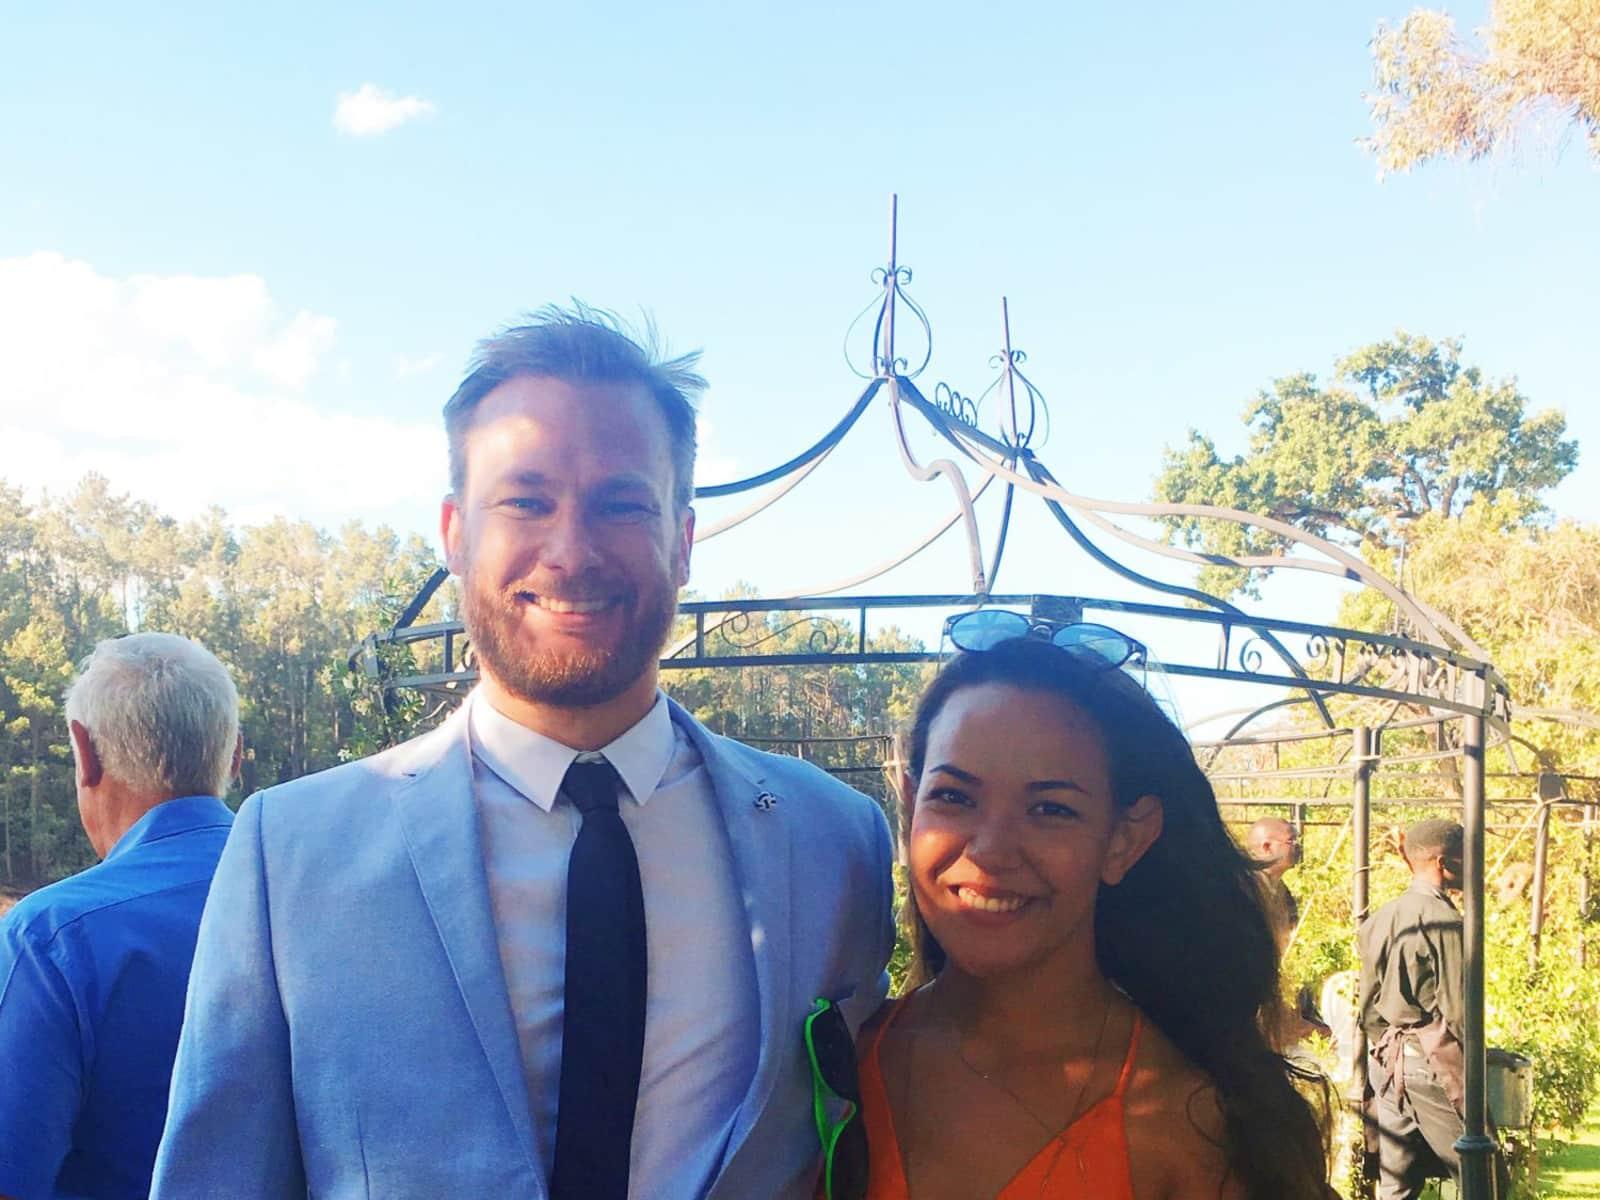 Samantha & Nicholas from Perth, Western Australia, Australia